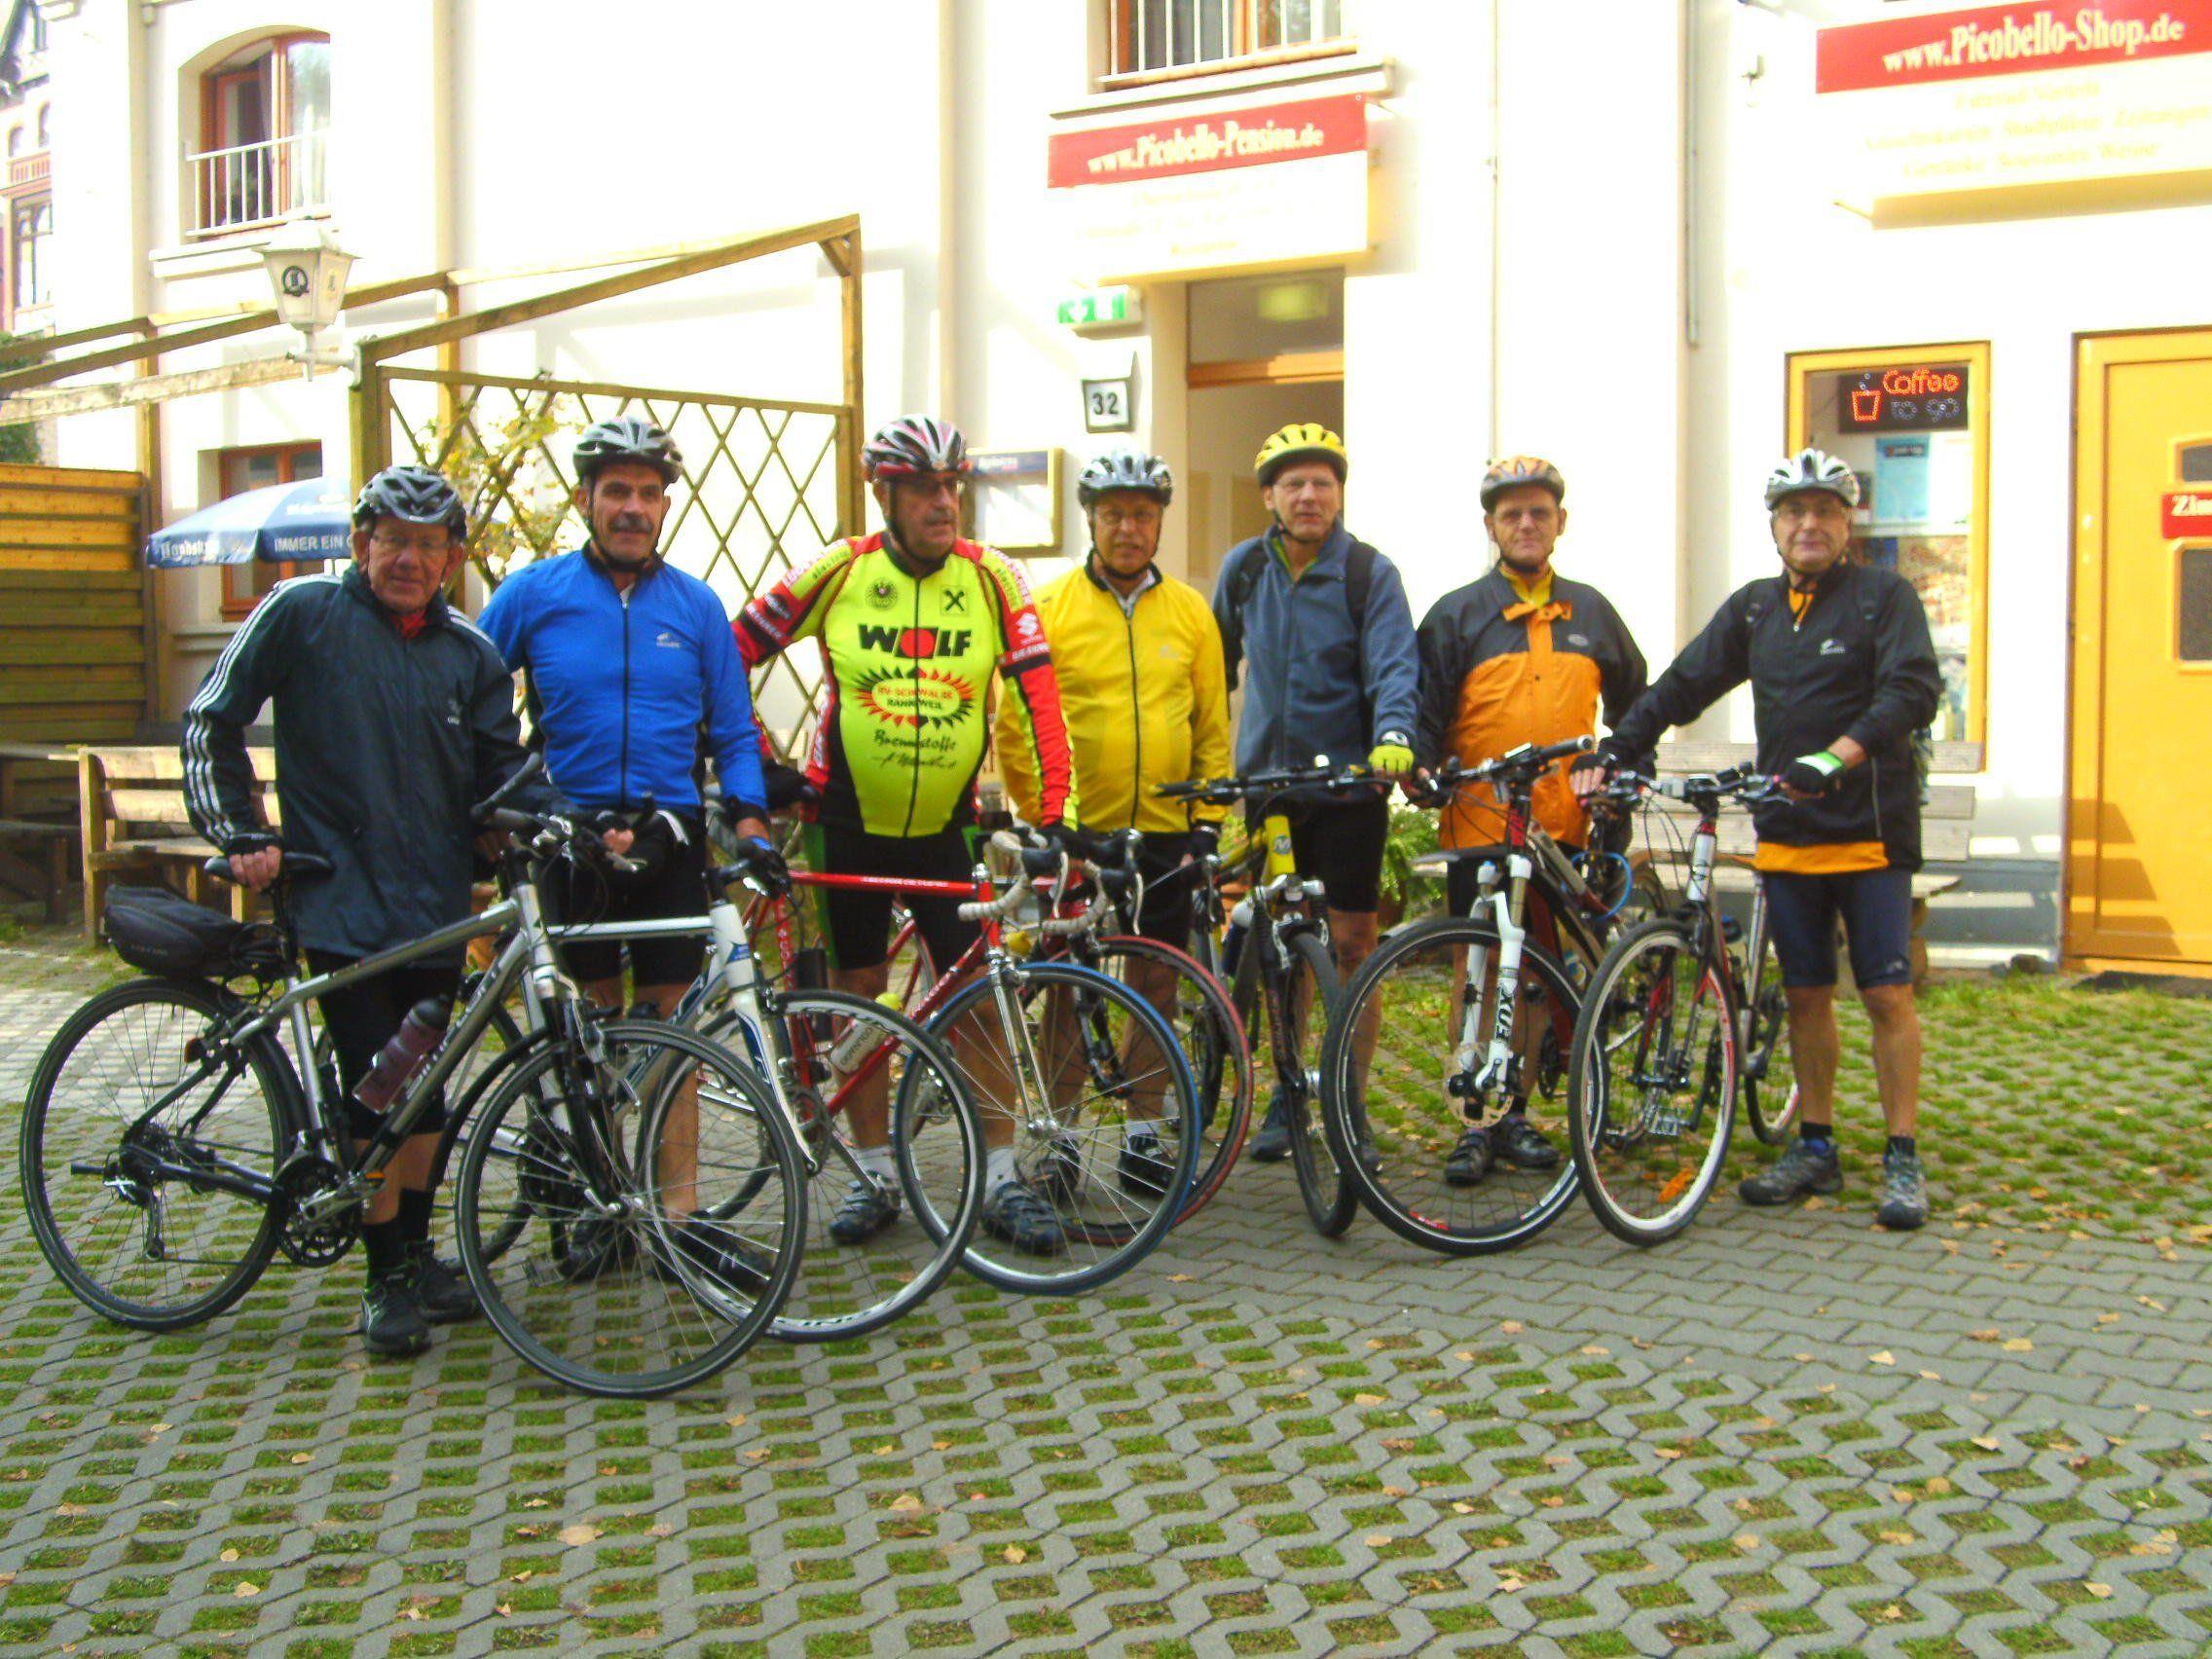 Die Radgruppe vor der Pension